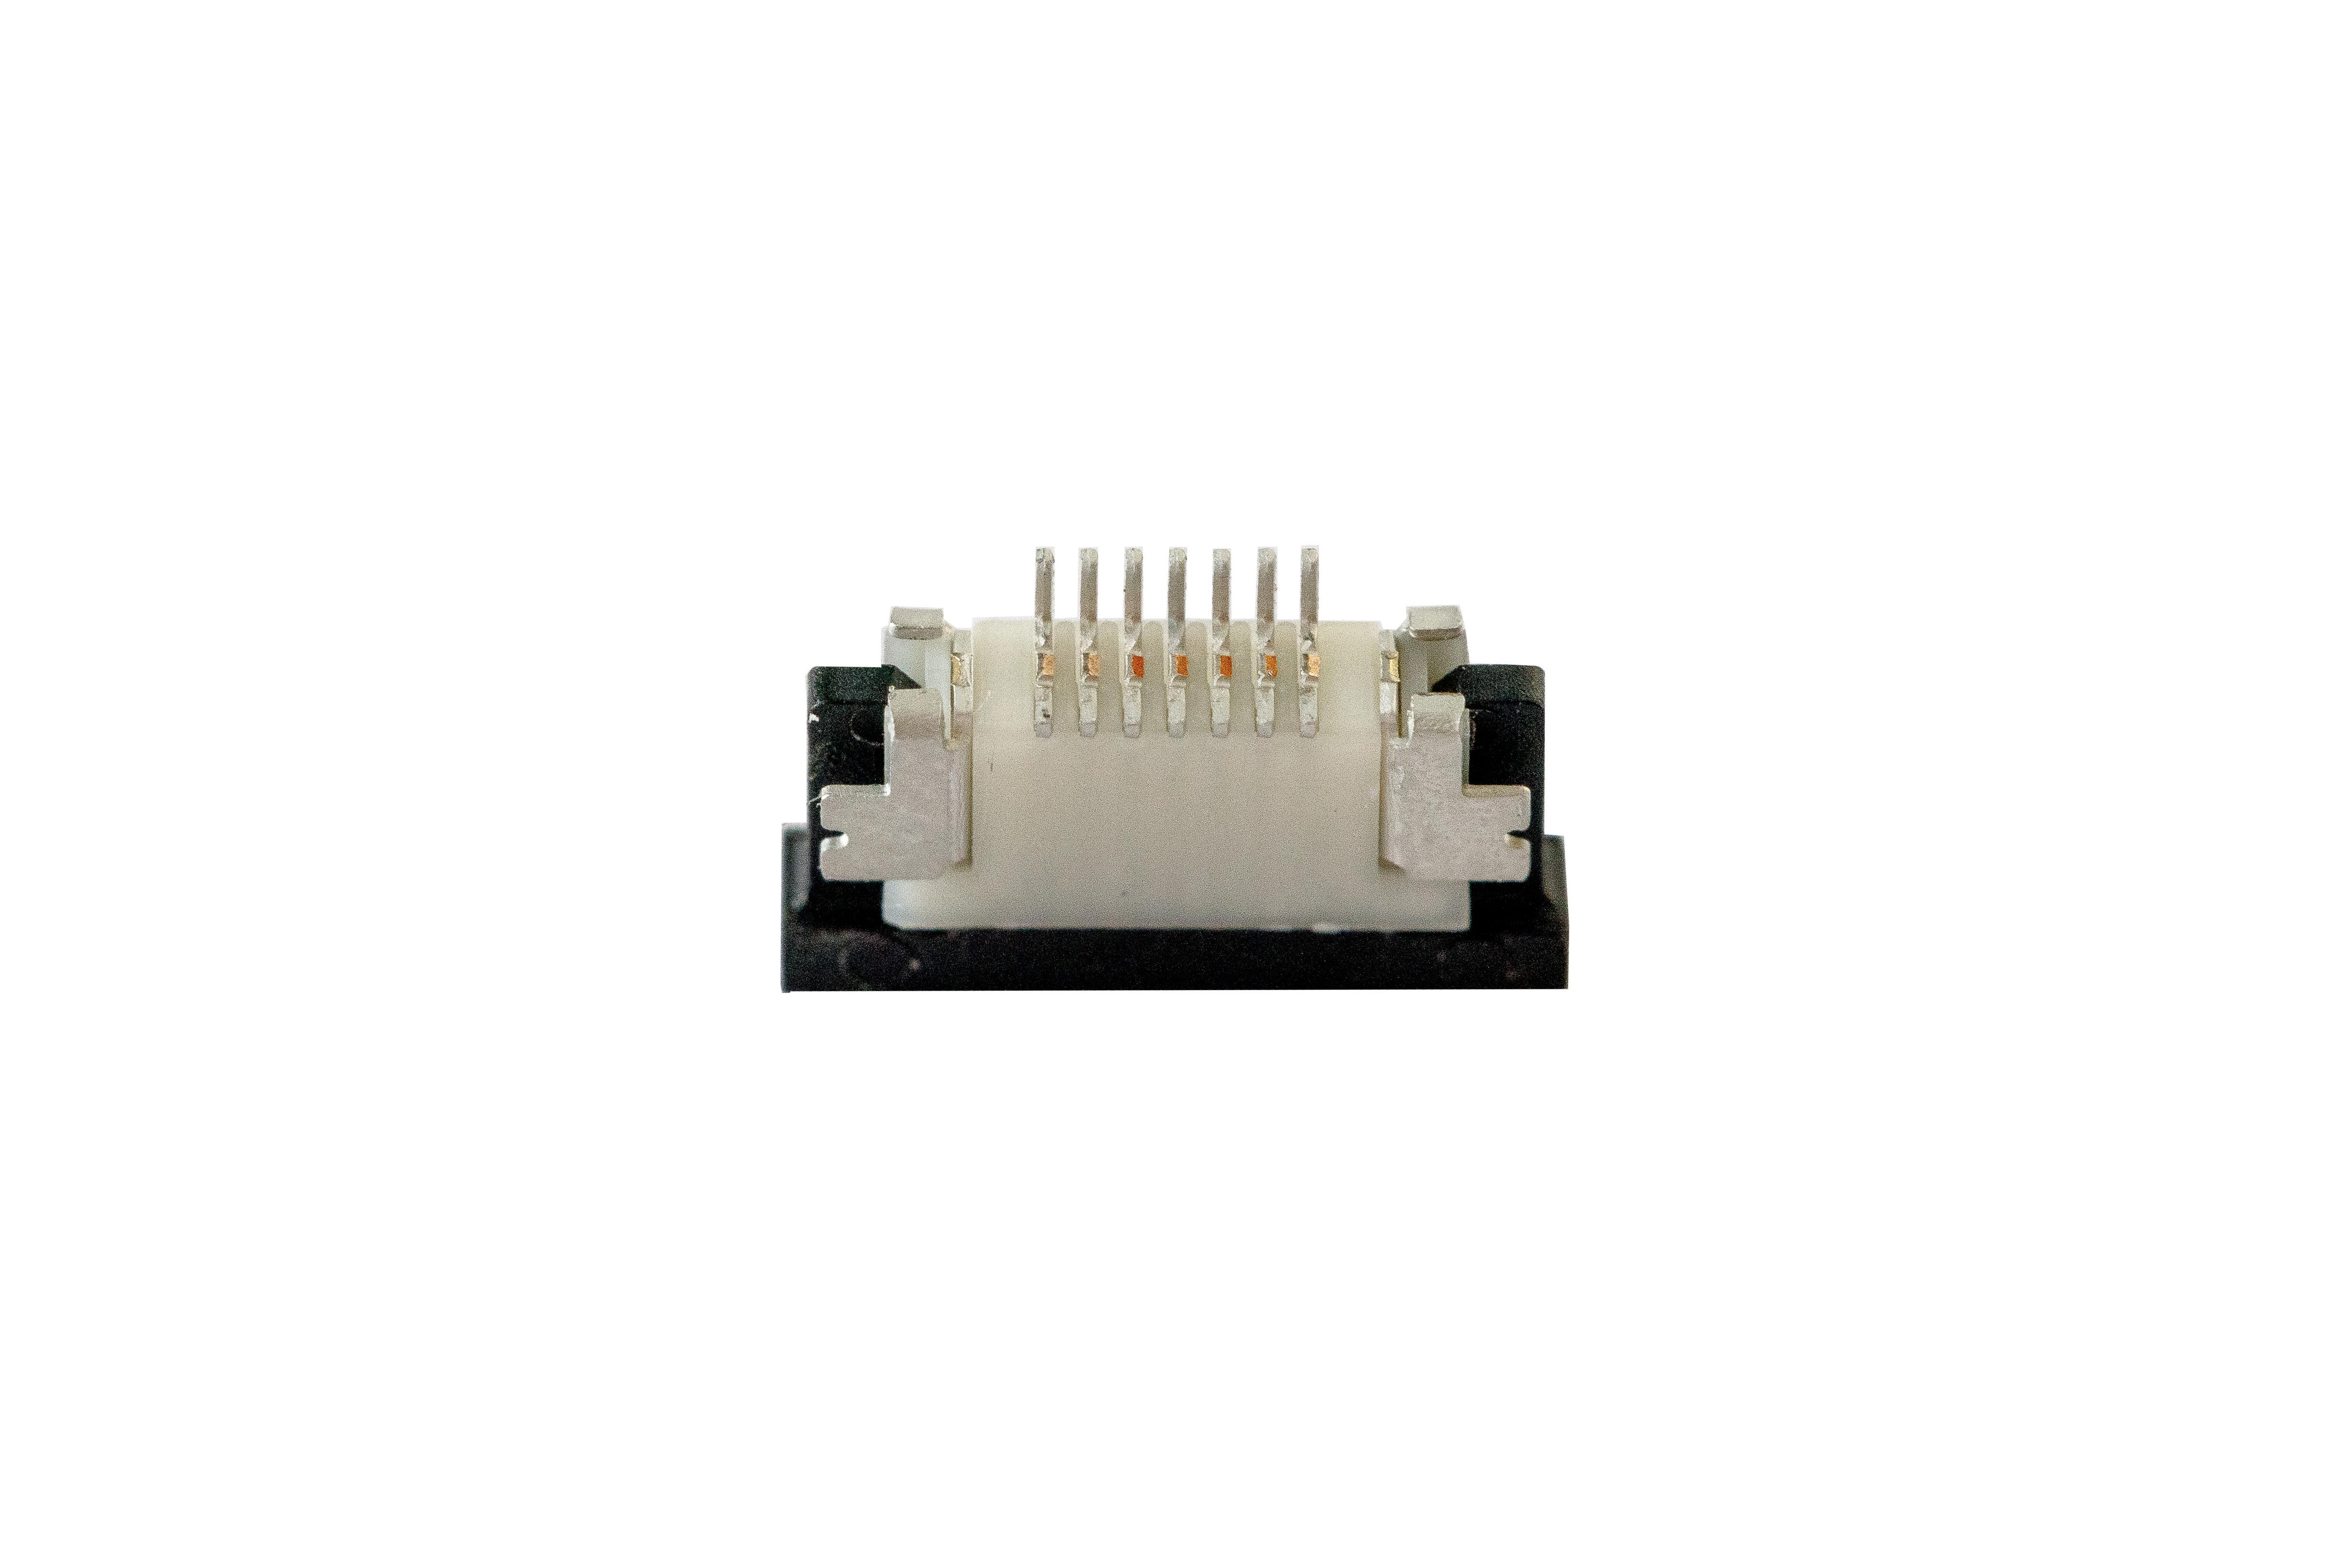 0510-2071R - FFC FPC Connector